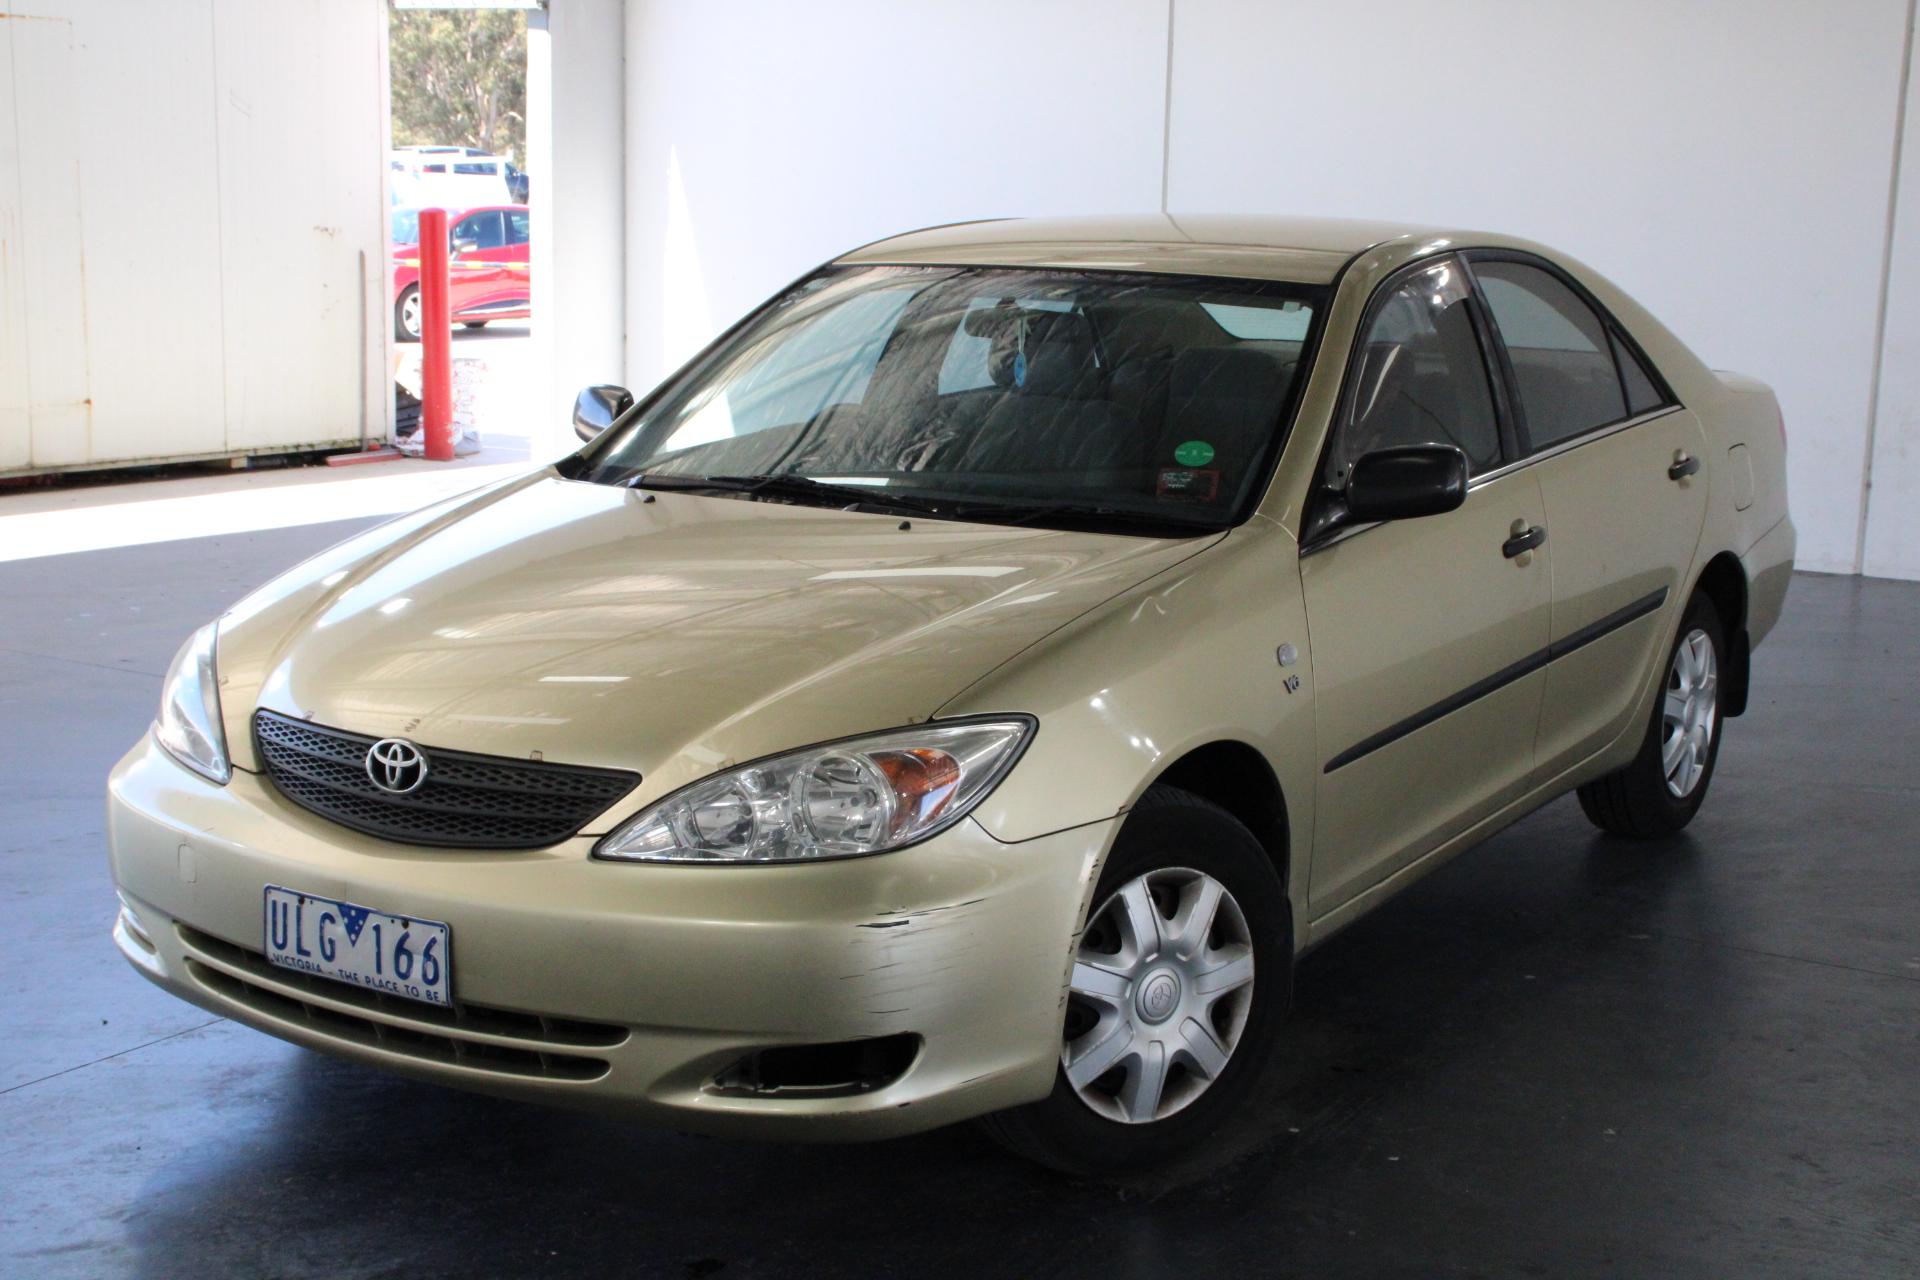 2002 Toyota Camry Altise MCV36R Automatic Sedan